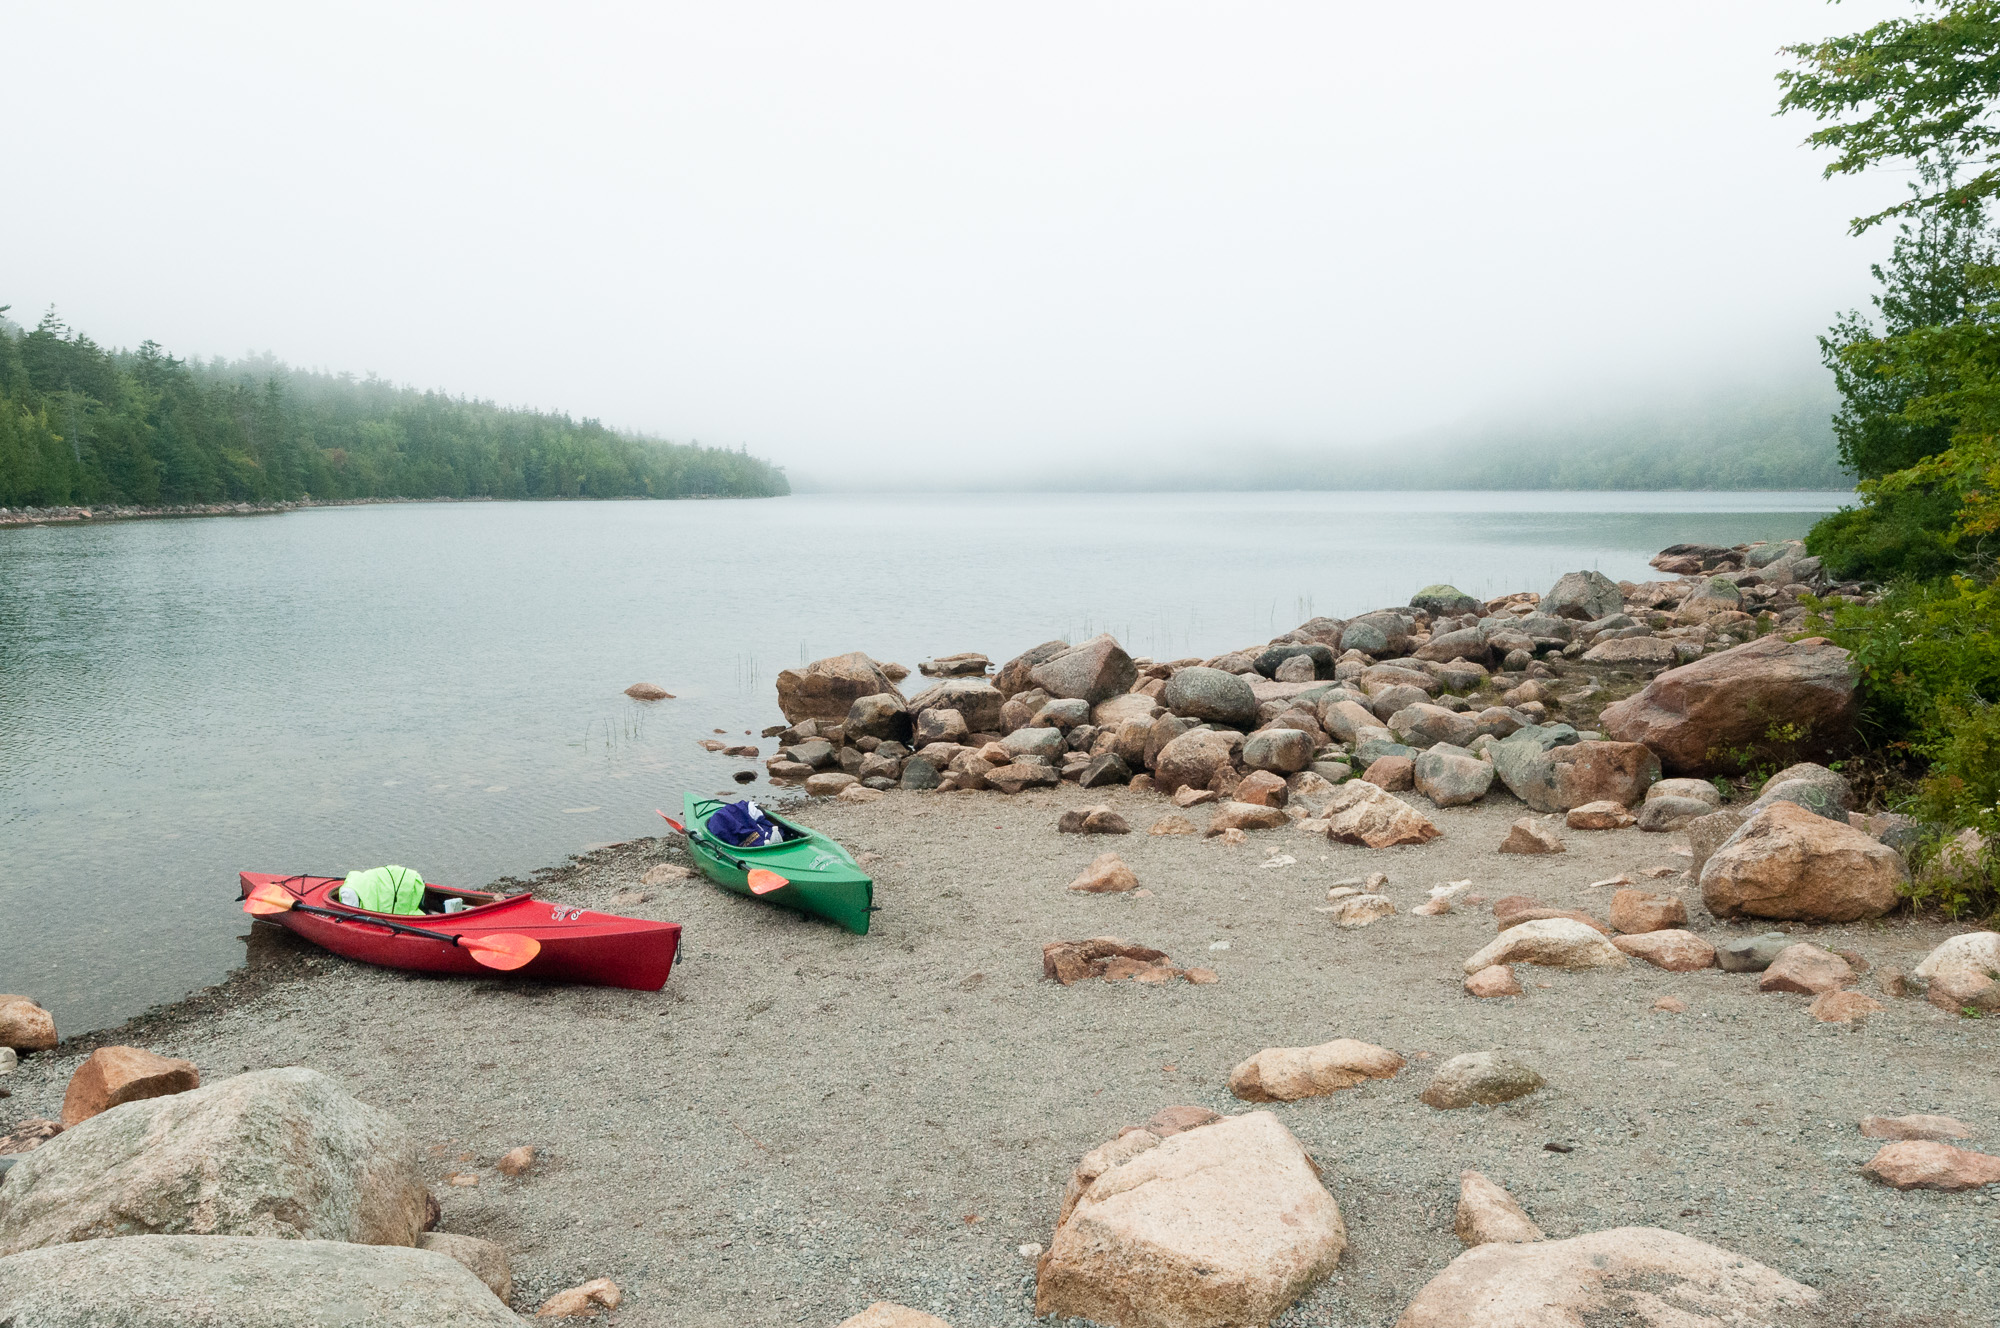 After Kayaking Jordan Pond